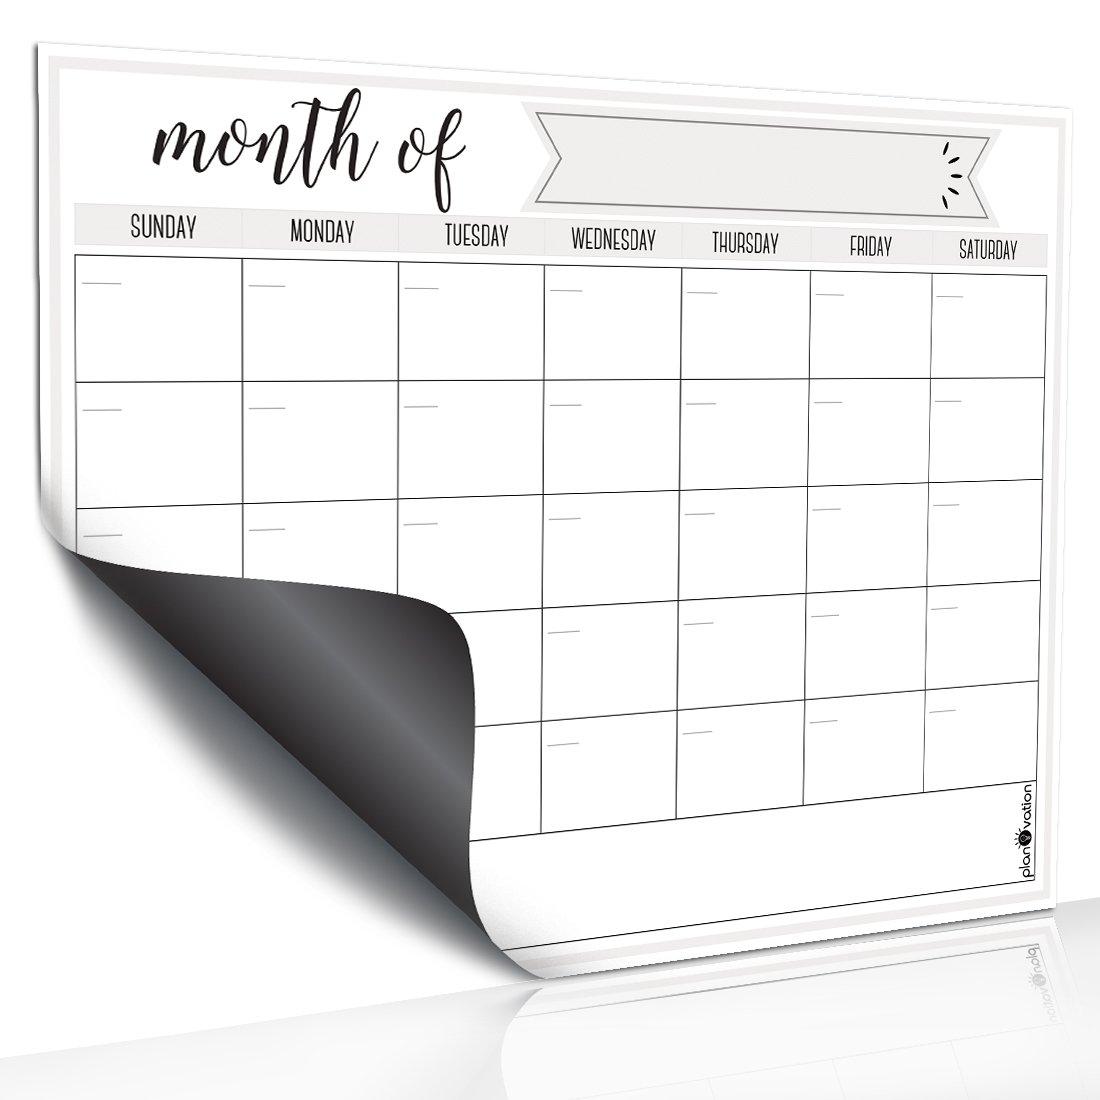 Magnetic Dry Erase Refrigerator Calendar by planOvation   Large Calendar Whiteboard Monthly Planner Magnet by planOvation